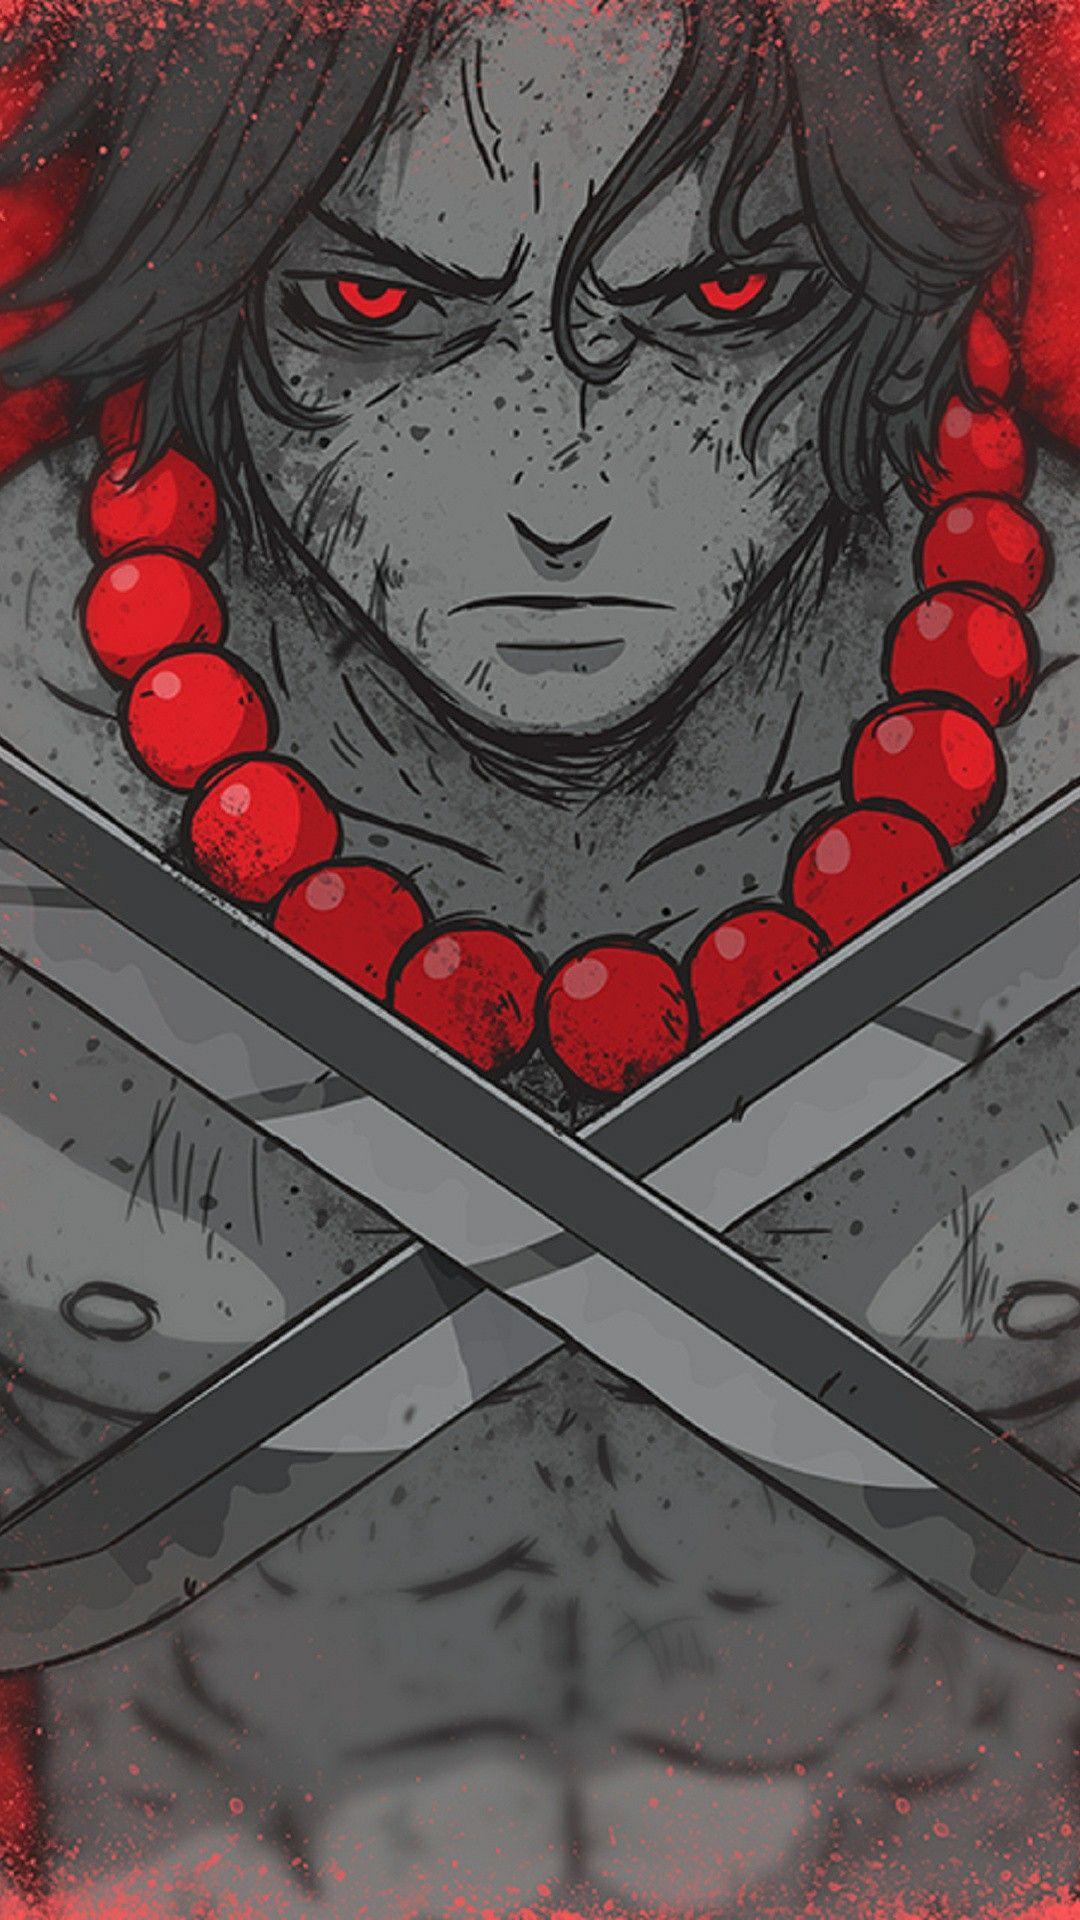 Ace Epic Badass Wallpaper One Piece One Piece Manga Anime